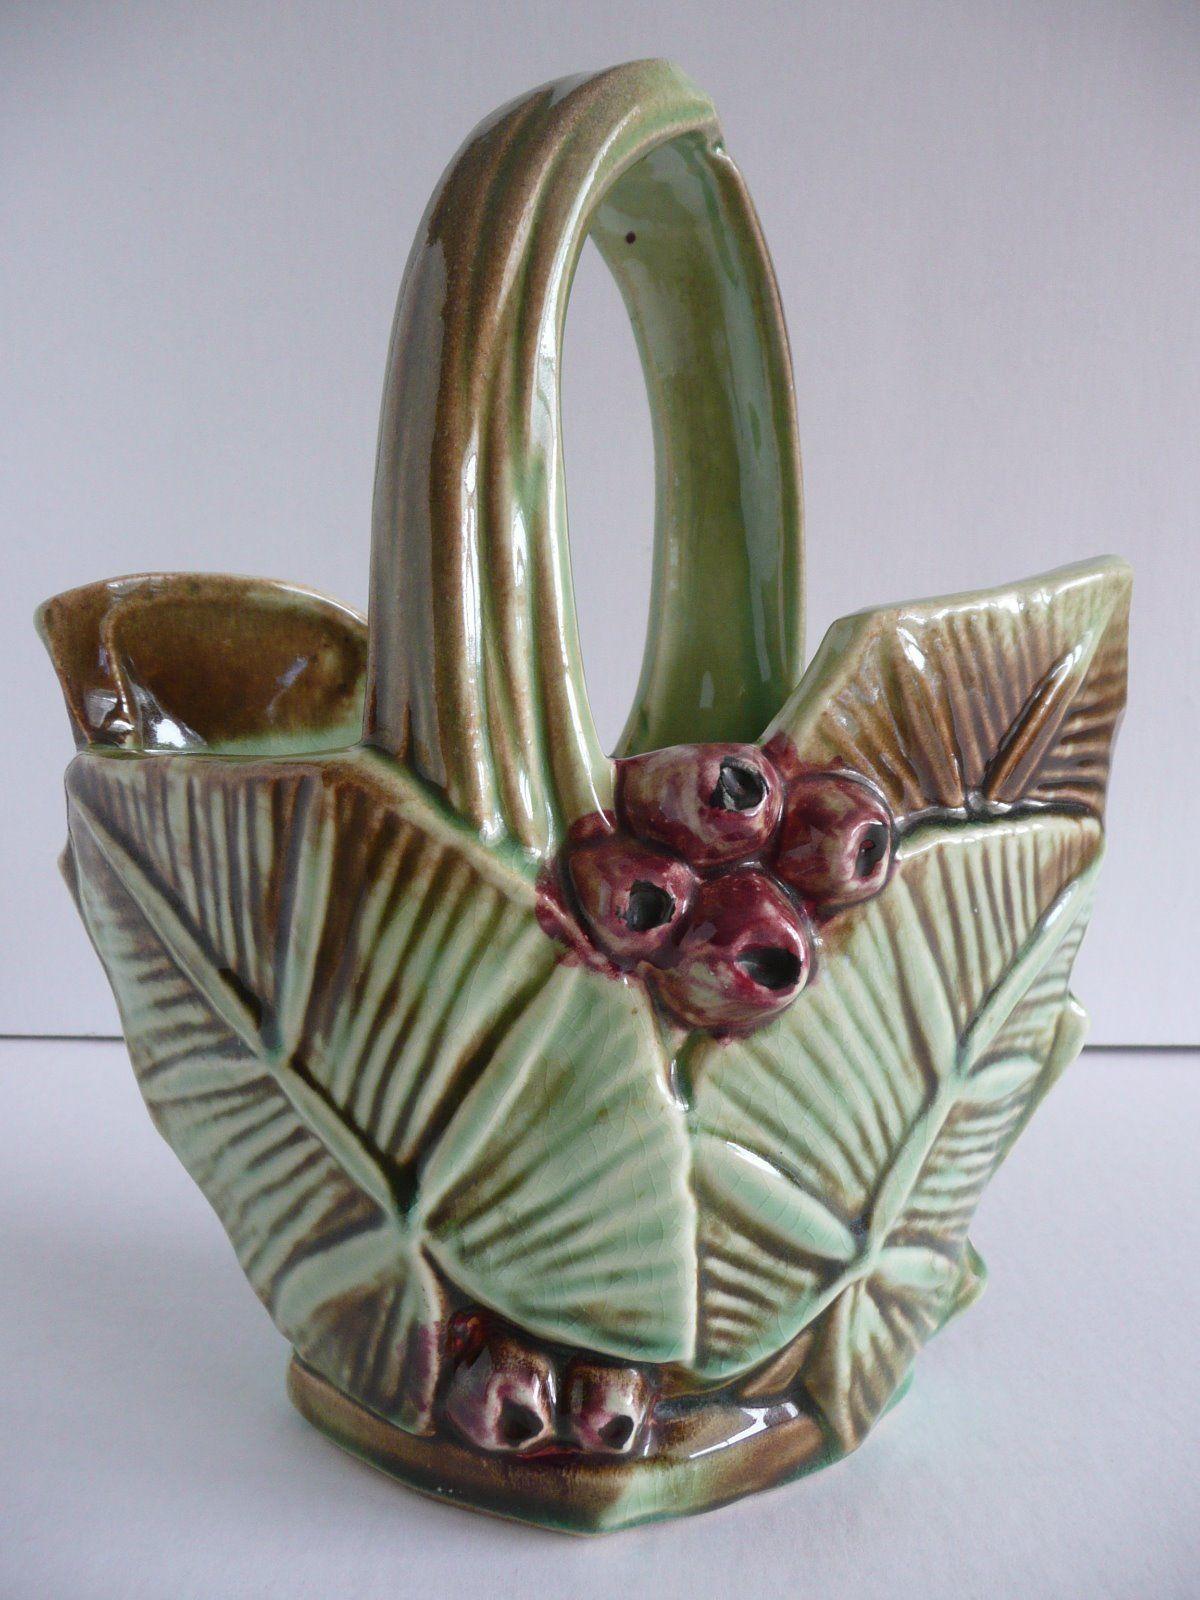 Vintage mccoy pottery greenbrown leaf red berry basket planter vintage mccoy pottery greenbrown leaf red berry basket planter handle vase picclick reviewsmspy